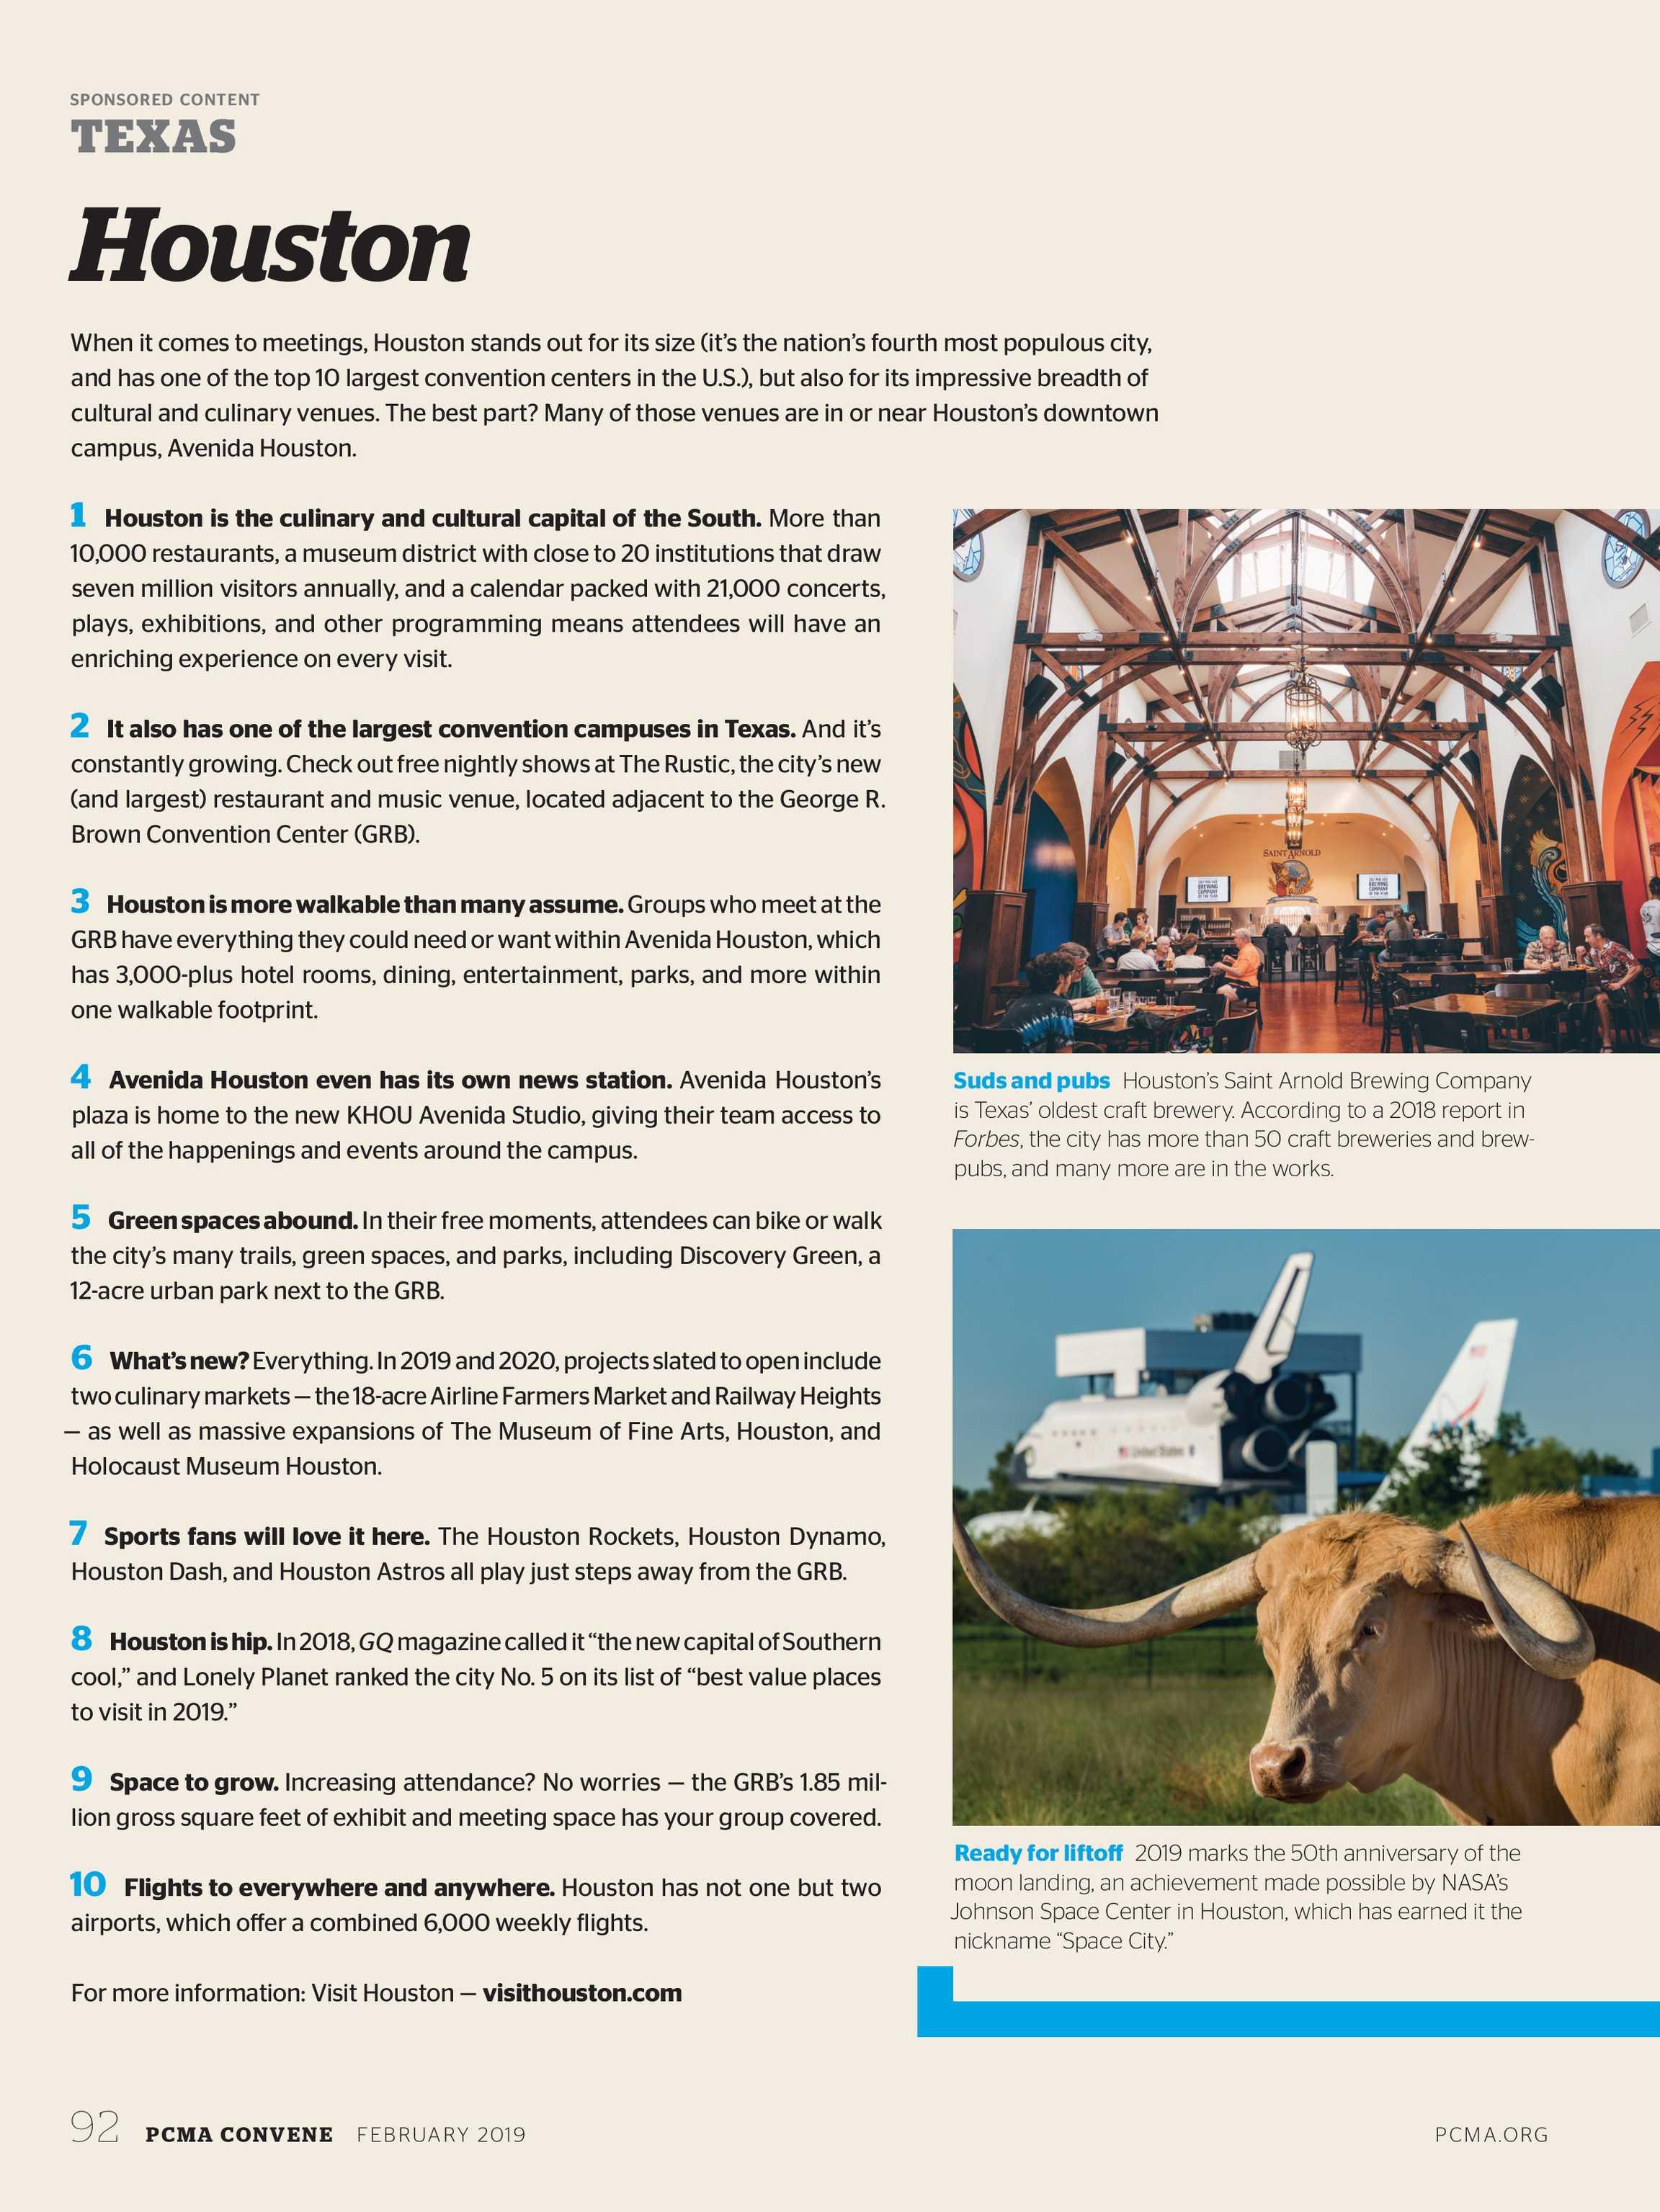 Best Houston Restaurants 2020 Convene   February 2019   page 92